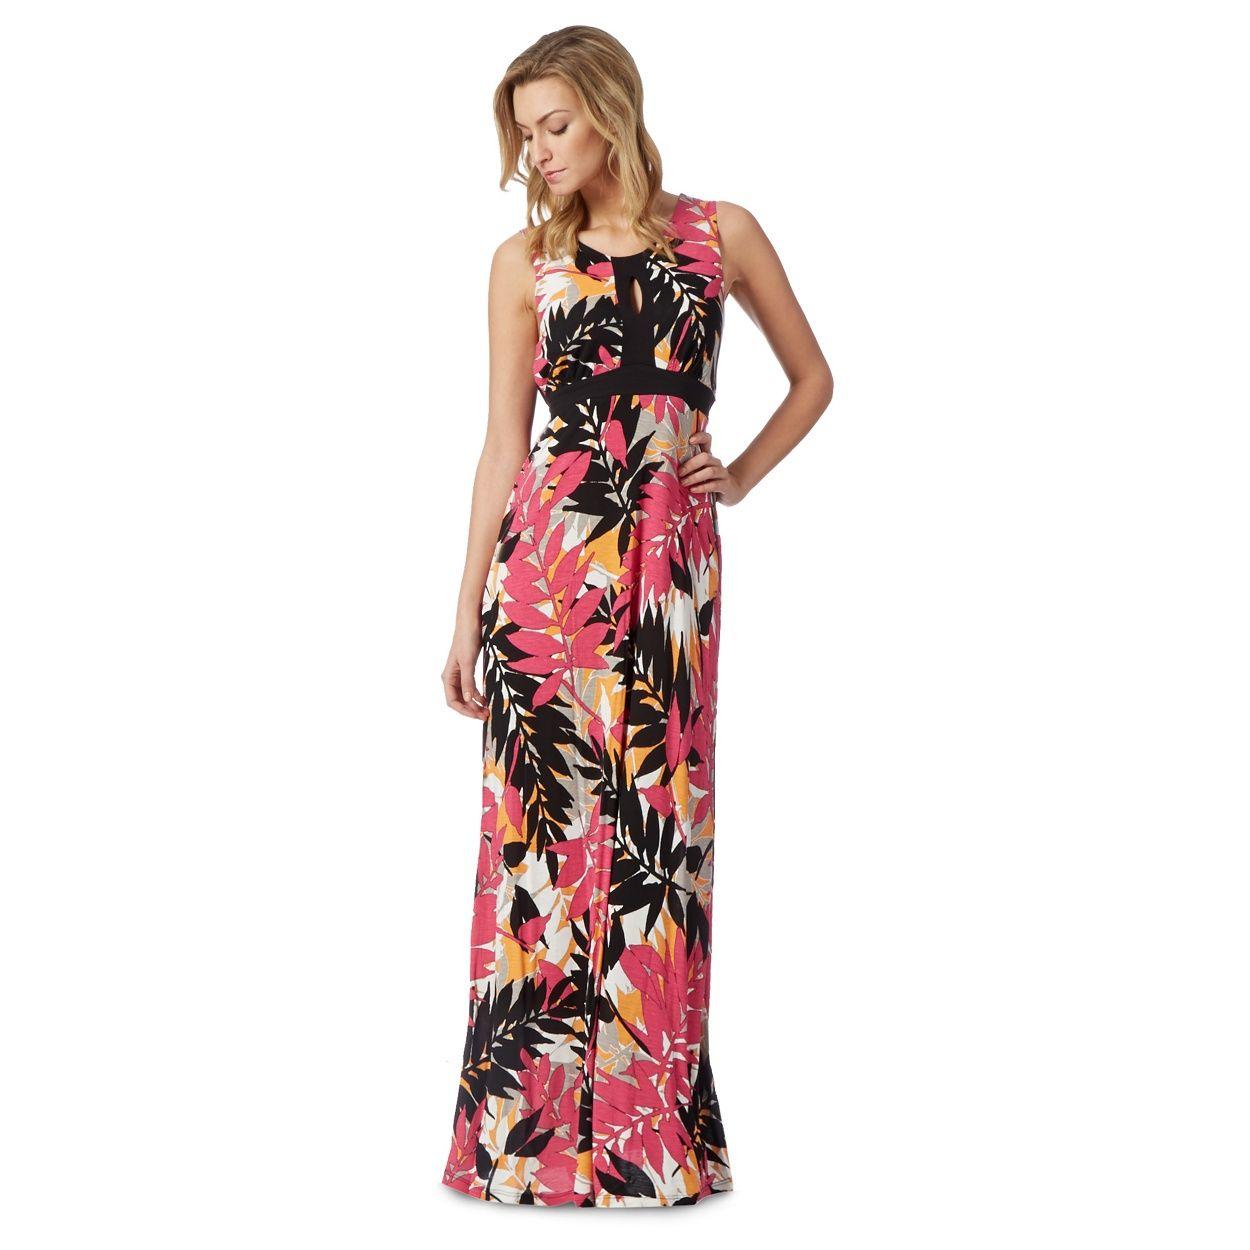 Black dress debenhams - The Collection Black And Pink Leaf Print Maxi Dress At Debenhams Com